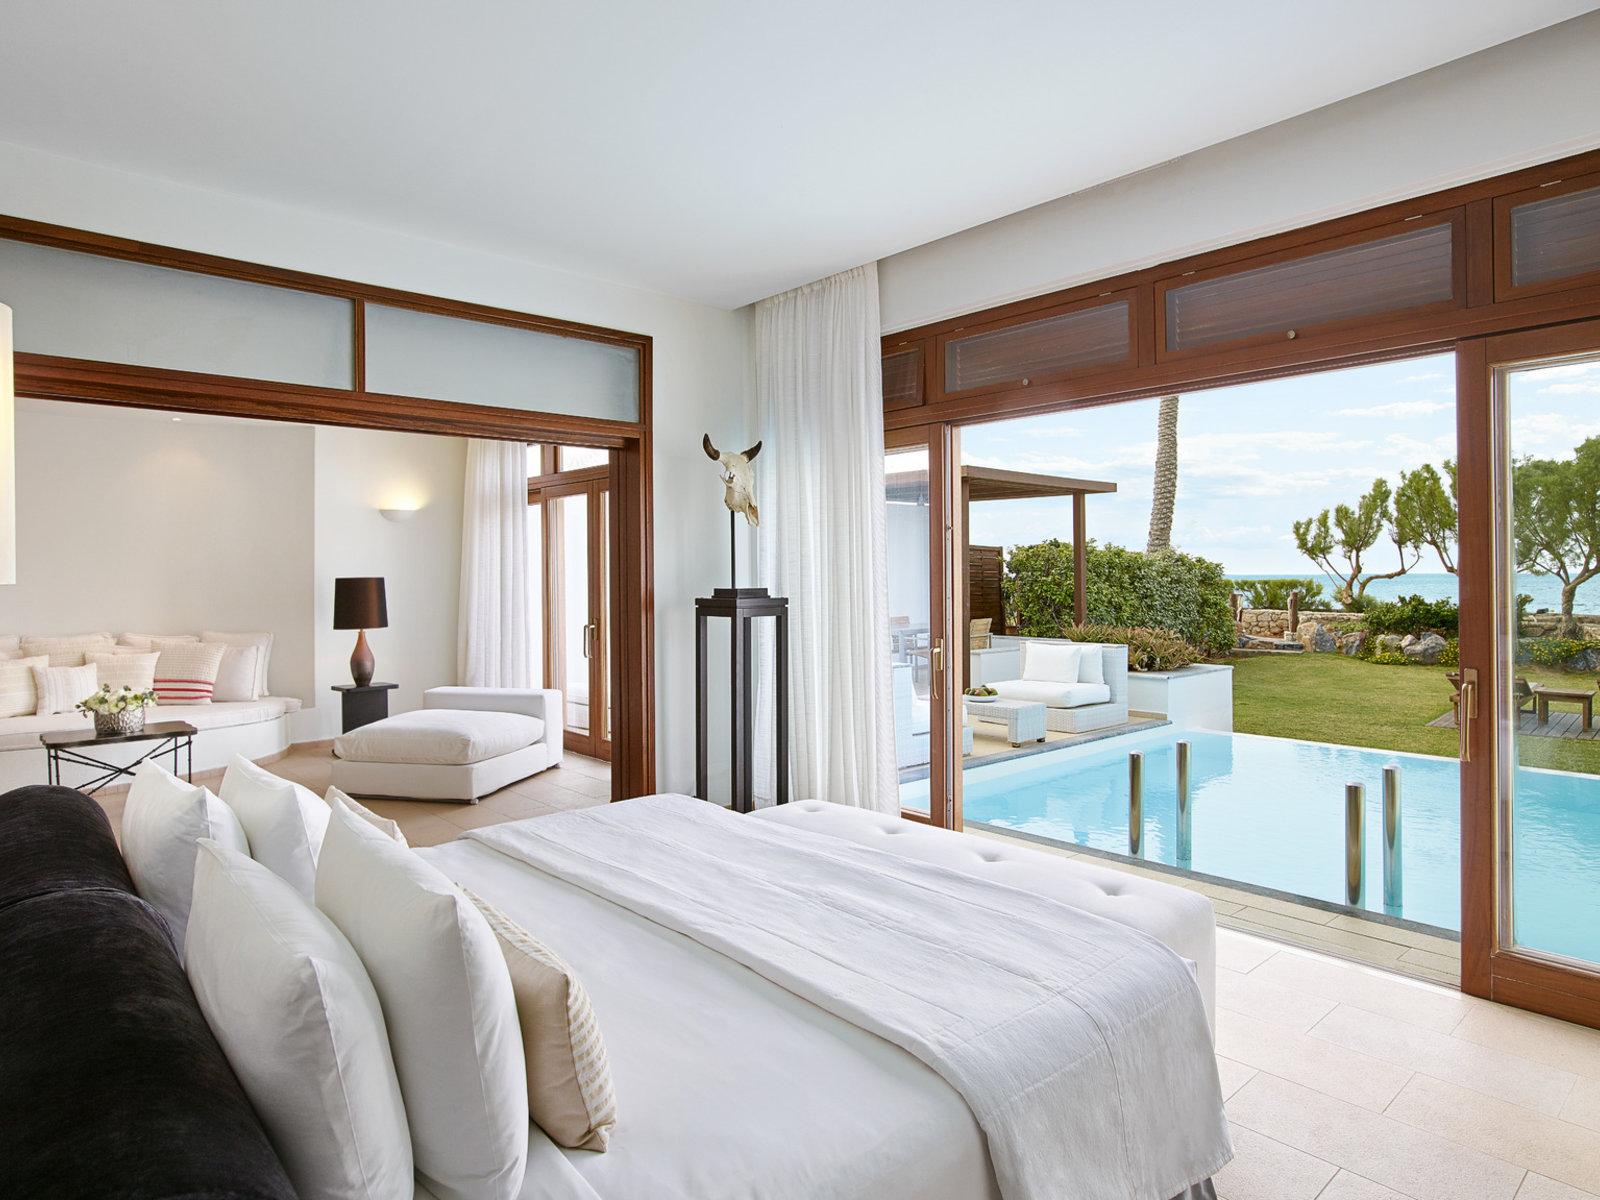 Wohnbeispiel Presidential Villa Sea View private pool